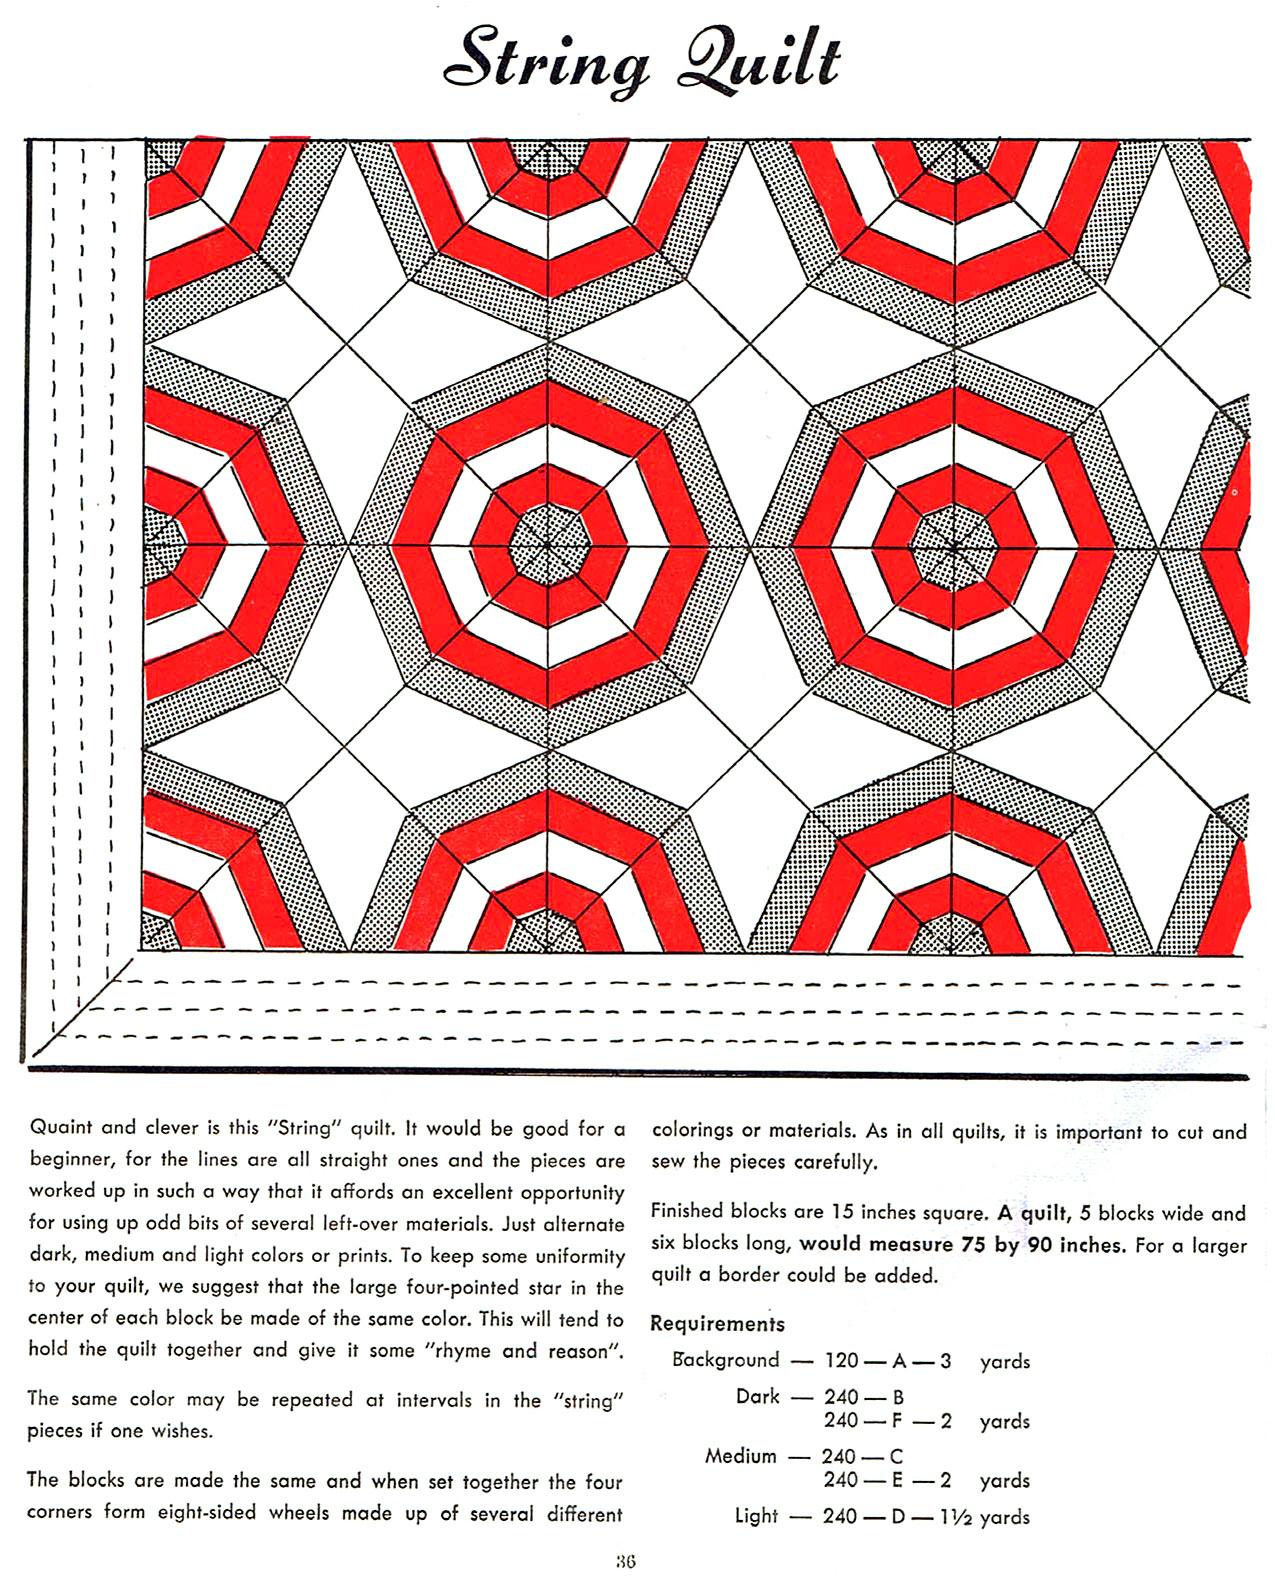 http://qisforquilter.com/wp-content/uploads/2012/11/Sixteen-Blue-Ribbon-Quilts-38.jpg